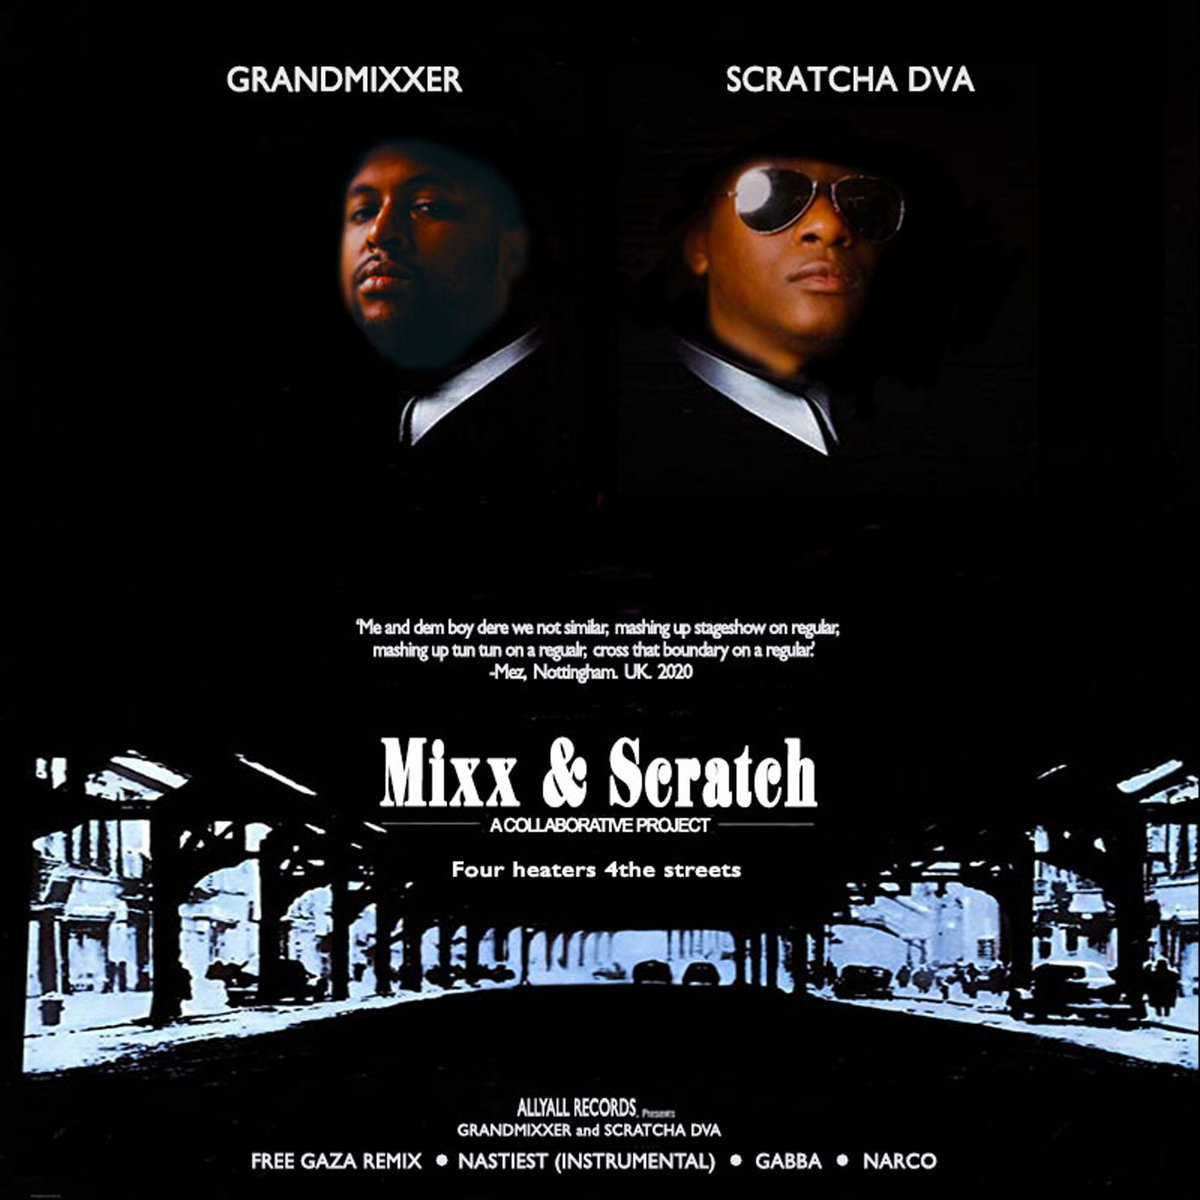 Scratcha DVA And Grandmixxer Combine For Genre-Crossing Tour De Force 'Mixx & Scratch'